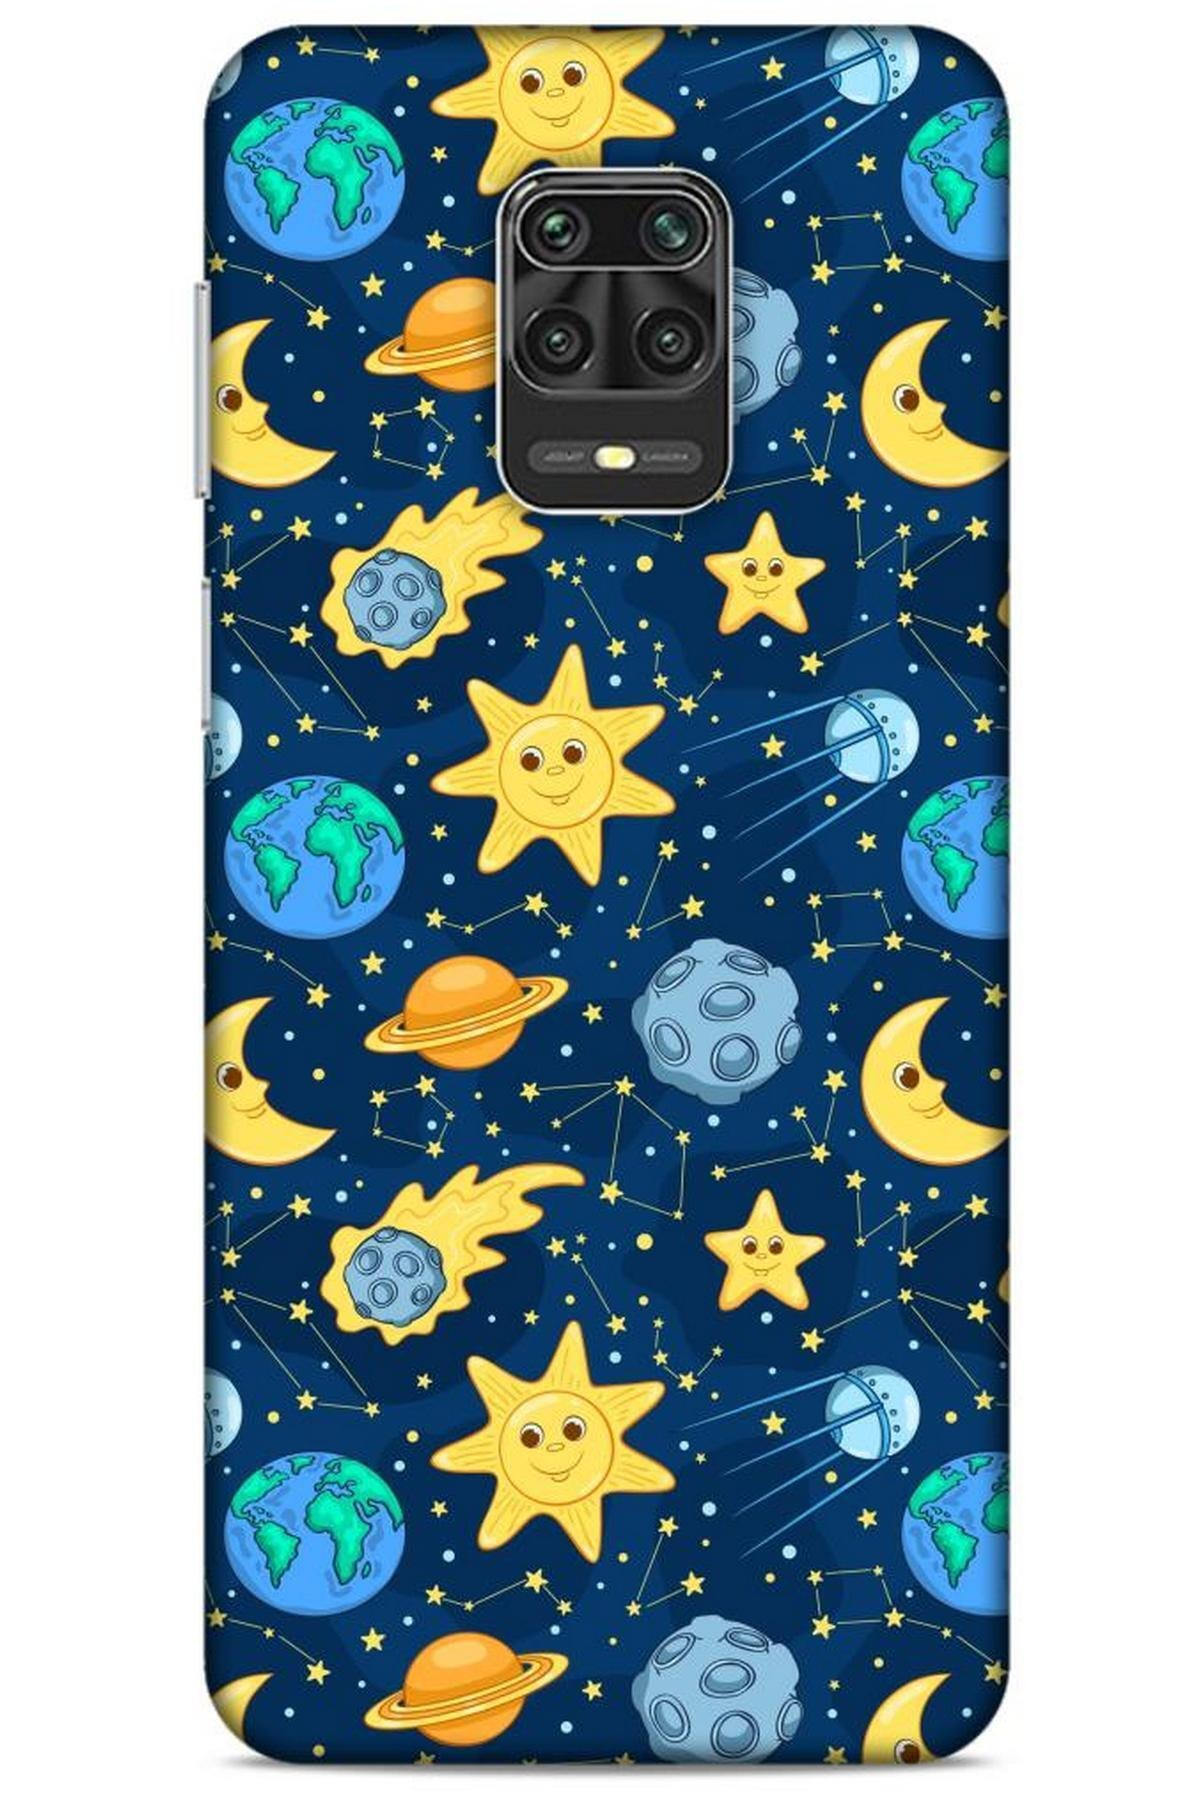 Lopard Spacex (6) Tema Silikon Kılıf Xiaomi Redmi Note 9s Kılıf 1